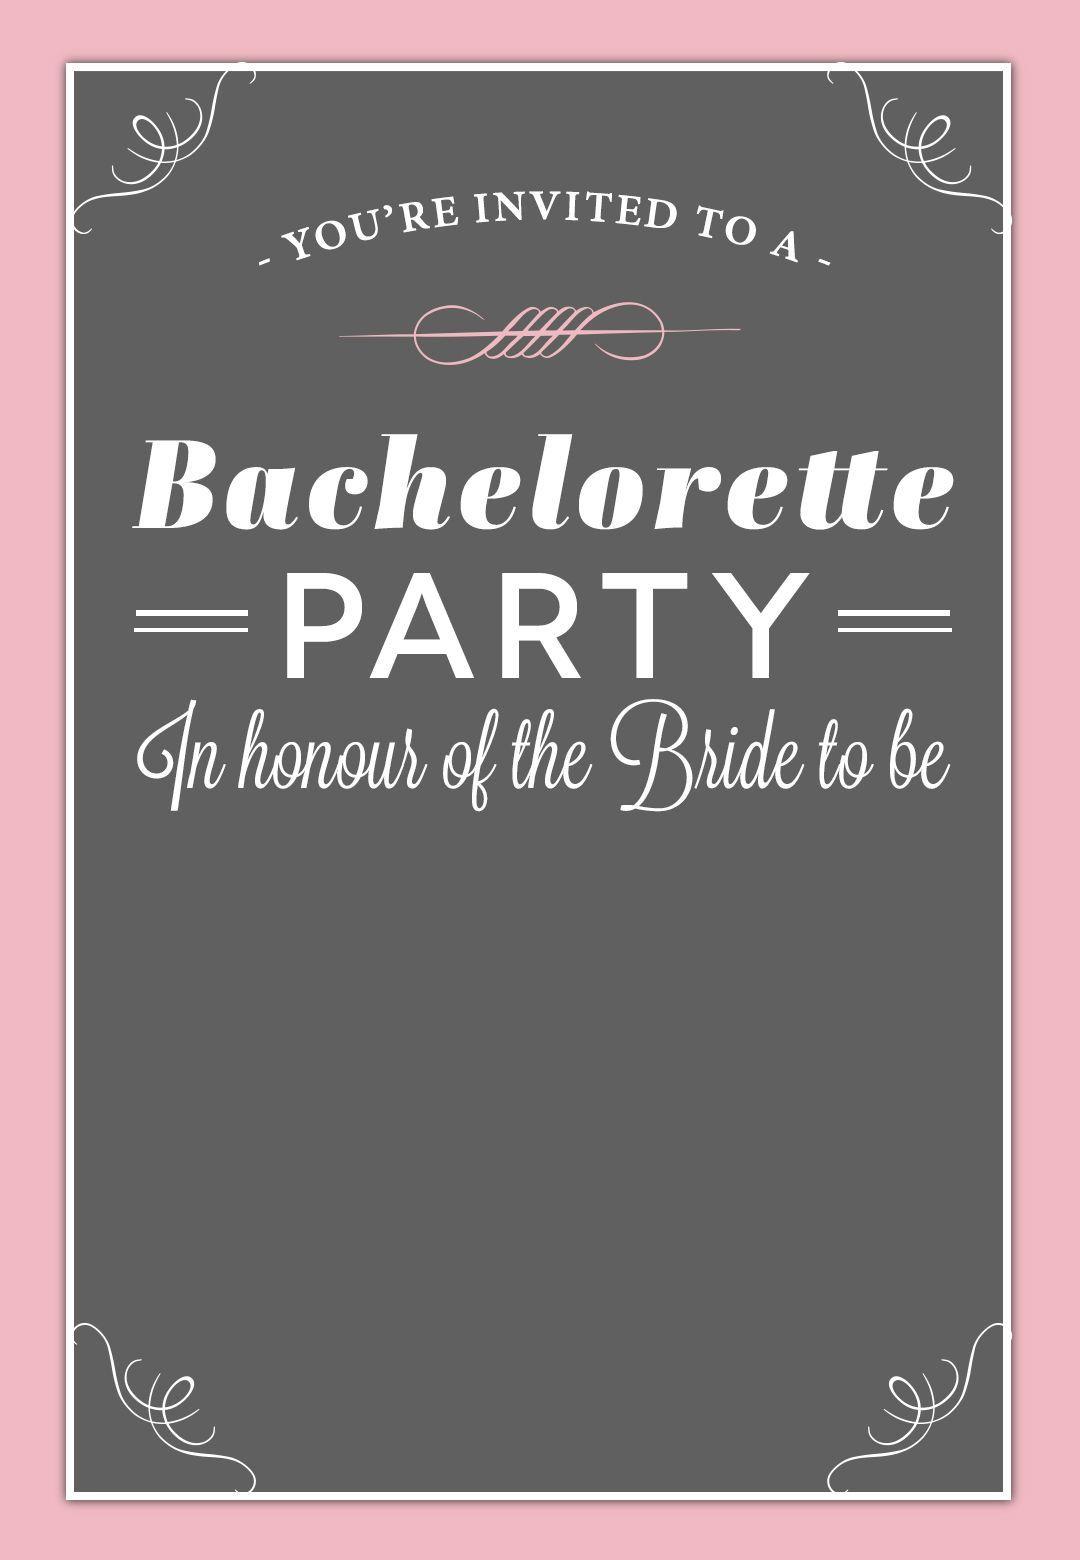 002 Best Bachelorette Party Invitation Template Word Free Design Full